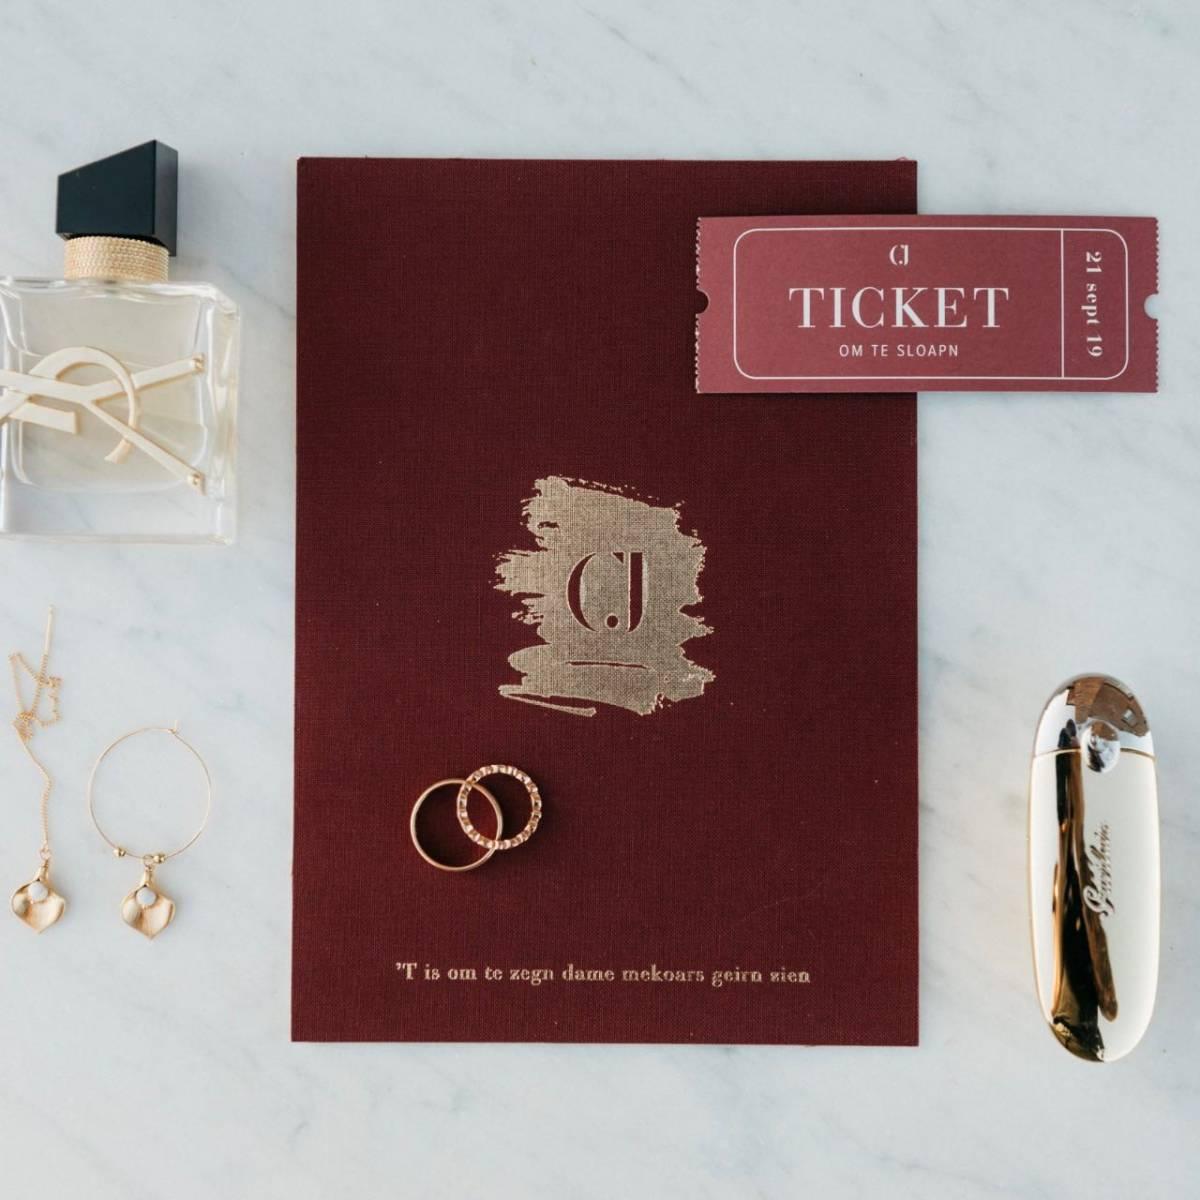 Scarabar - Trouwuitnodiging - Huwelijksuitnodiging - Drukwerk - Huwelijk - Trouw - Bruiloft - House of Weddings - 32